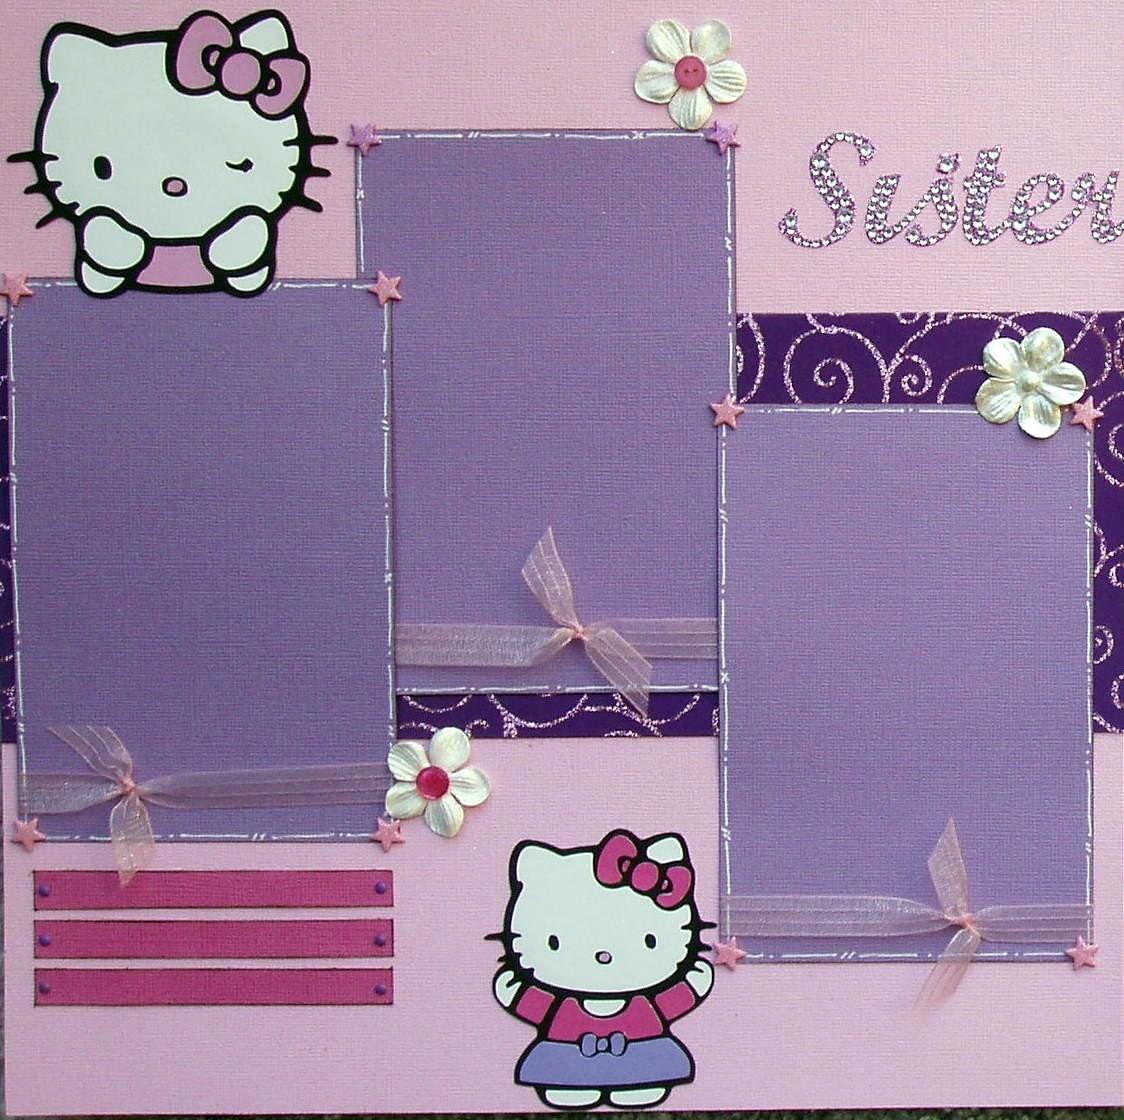 Hello kitty scrapbook ideas -  Scrapbook Layout Sisters Featuring Hello Kitty Zoom